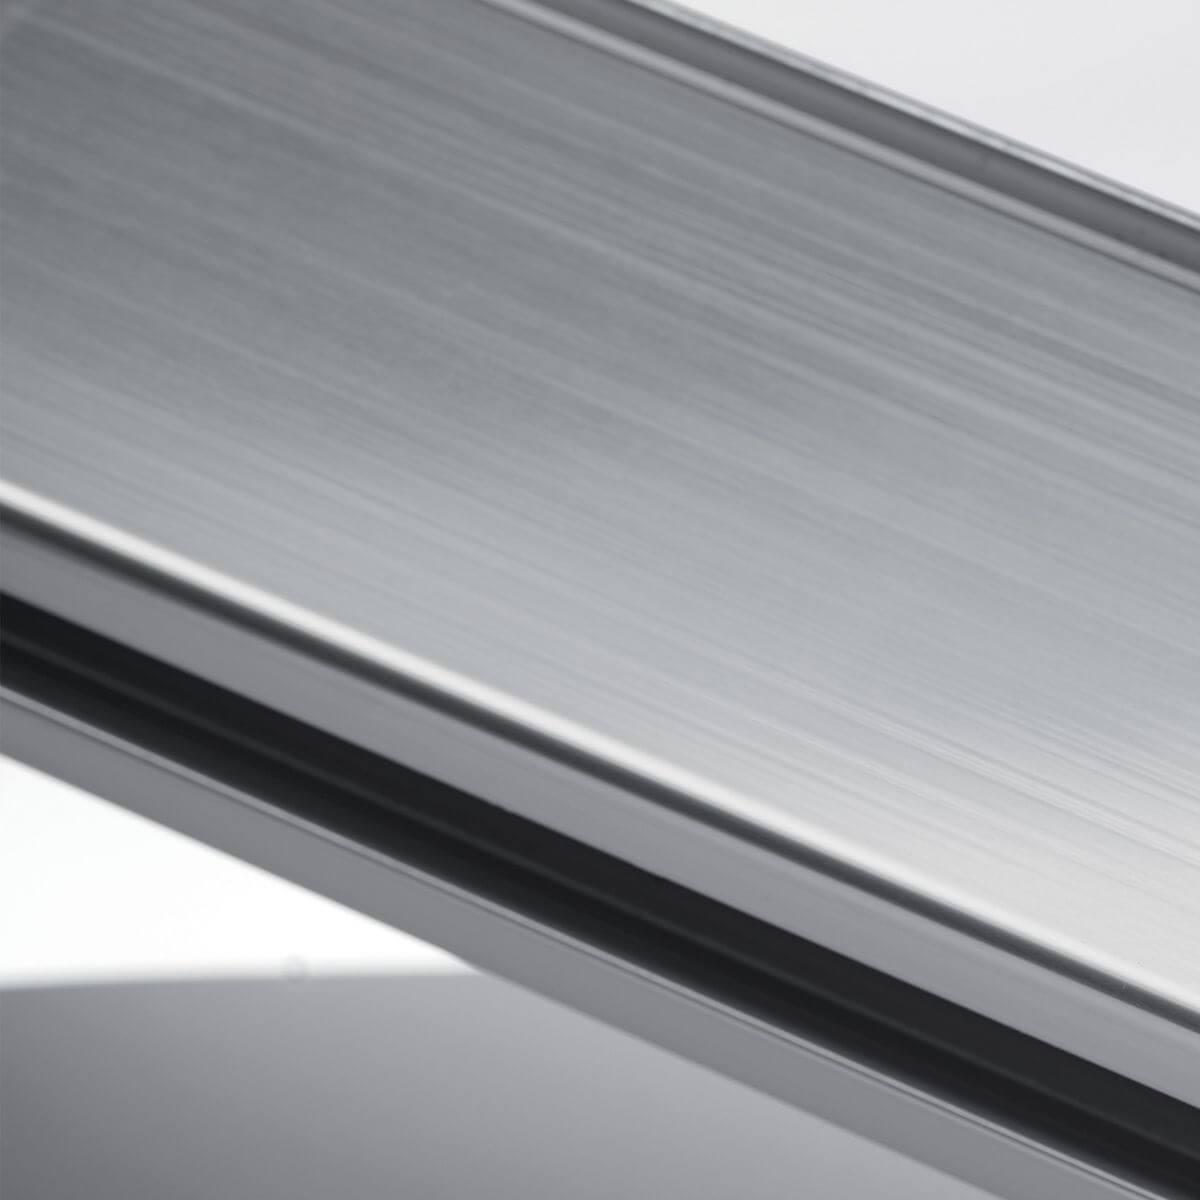 Polished aluminium finish for glass walls